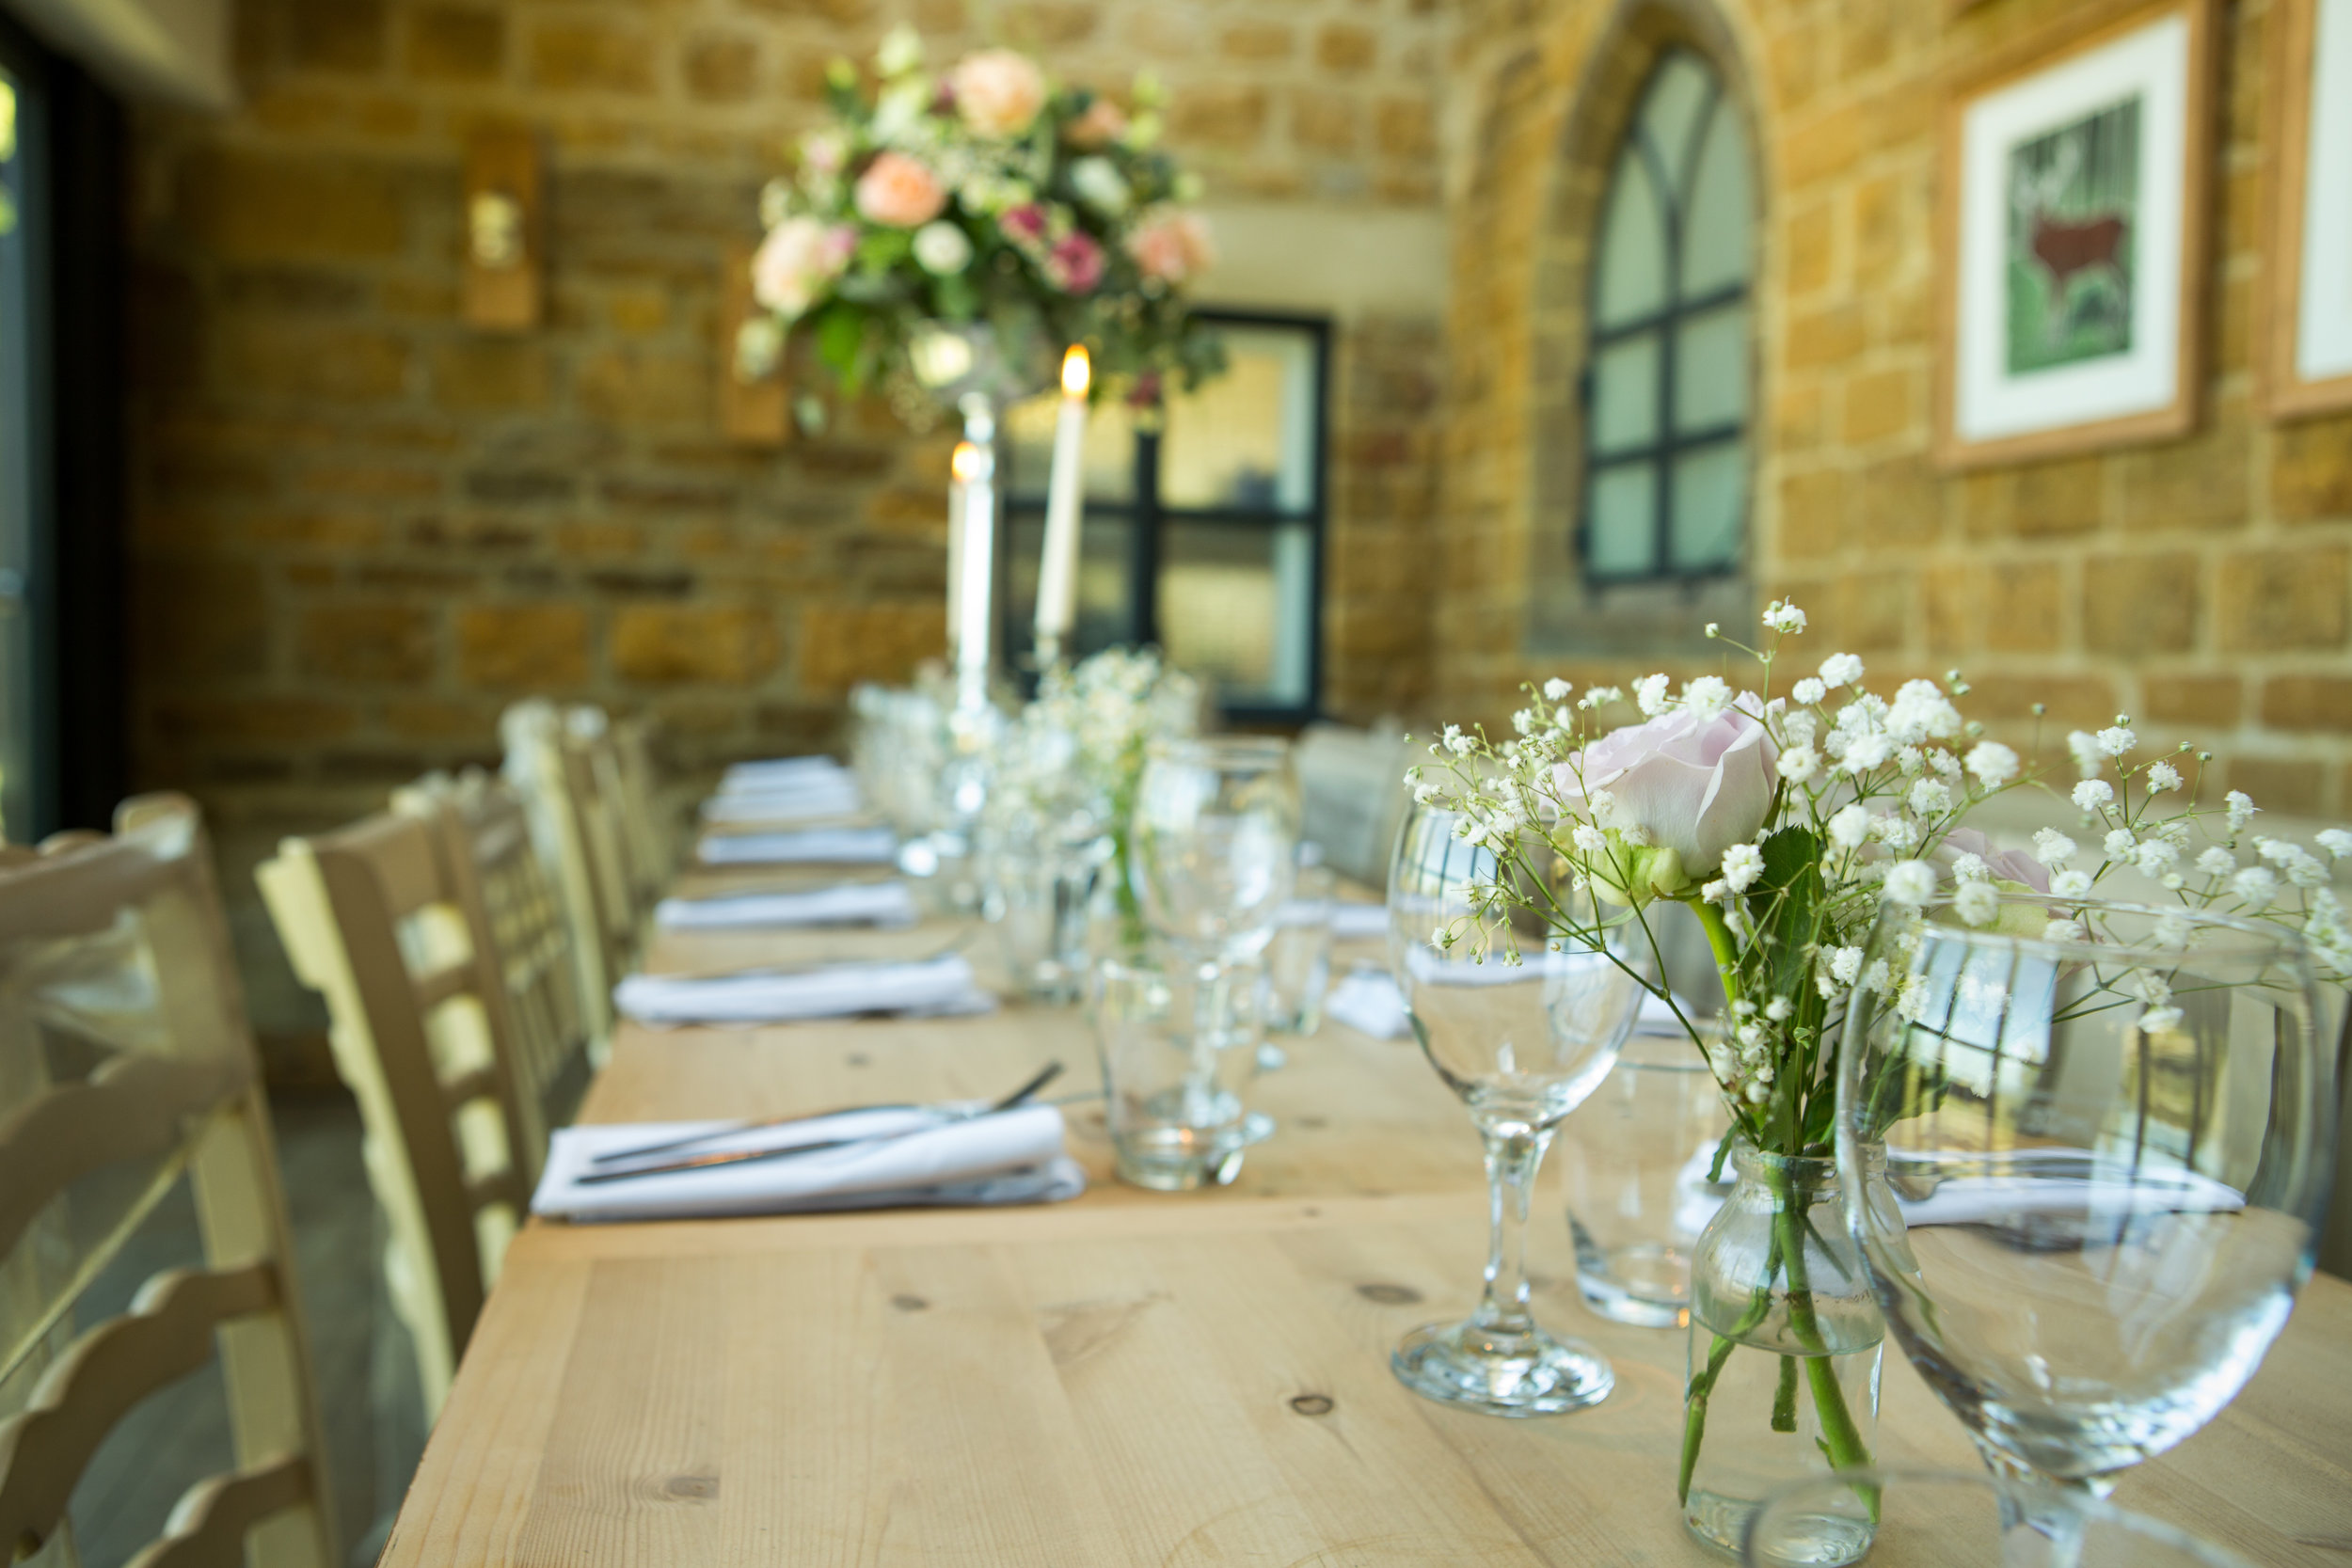 Breakfast at the best wedding venue in Banbury